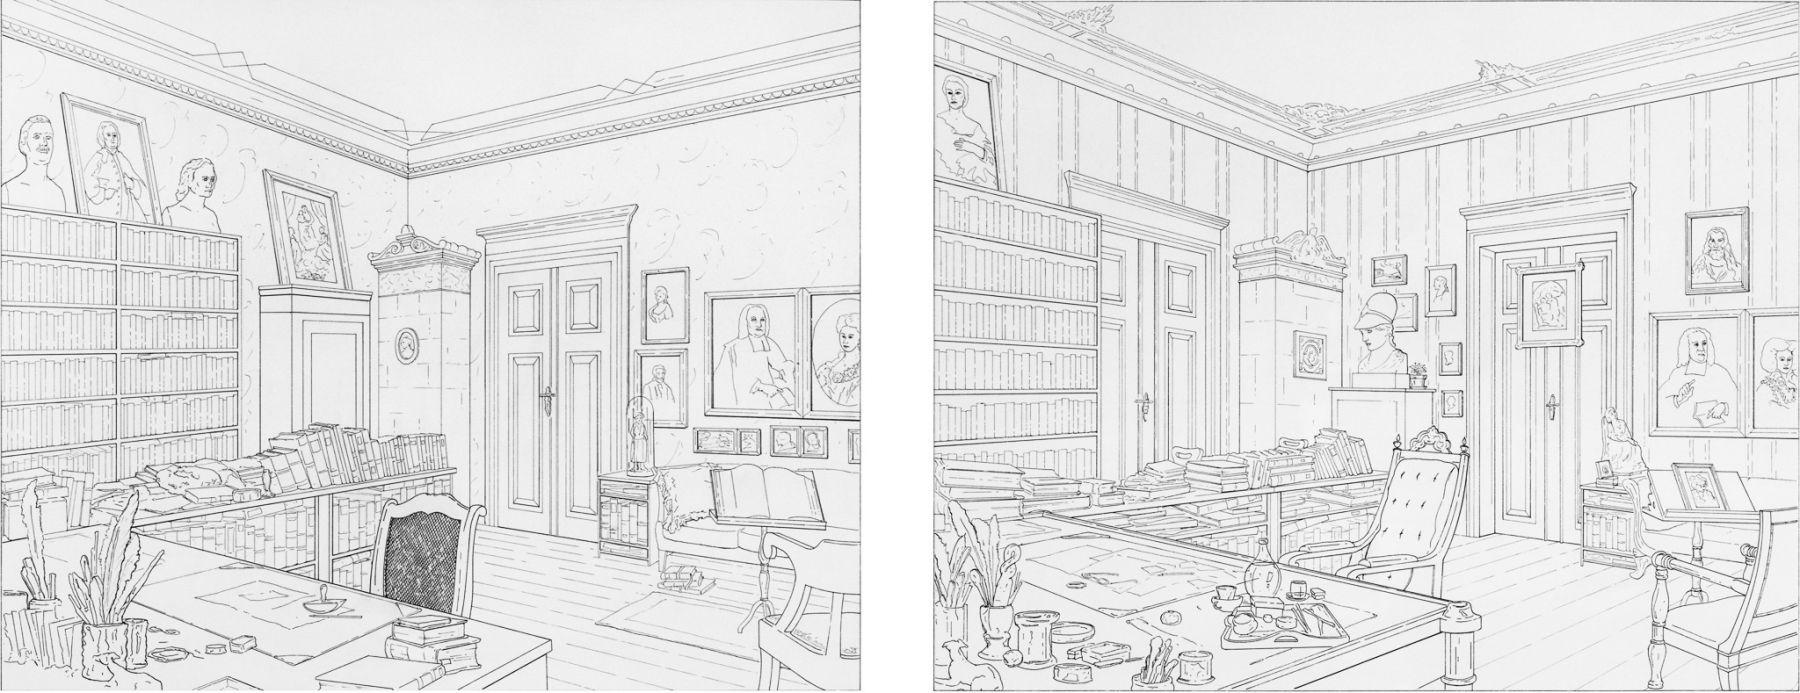 Rodney Graham, Jacob Grimm's Study in Berlin - Wilhelm Grimm's  Study in Berlin 1860, 1993